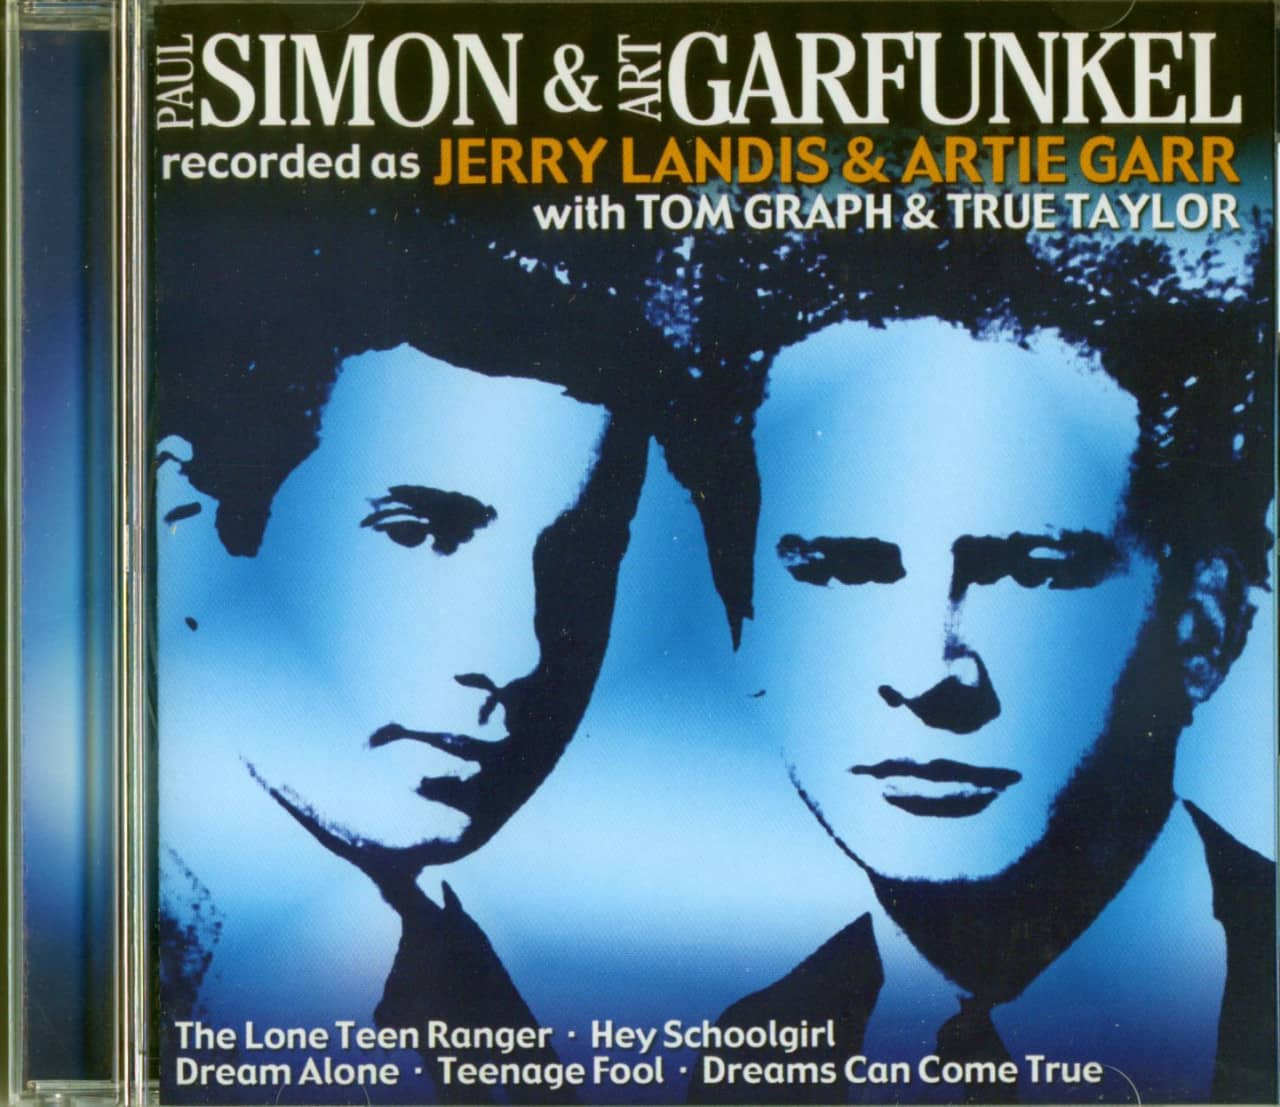 Simon & Garfunkel - Recorded as Jerry Landis & Artie Garr - 1950s Recordings